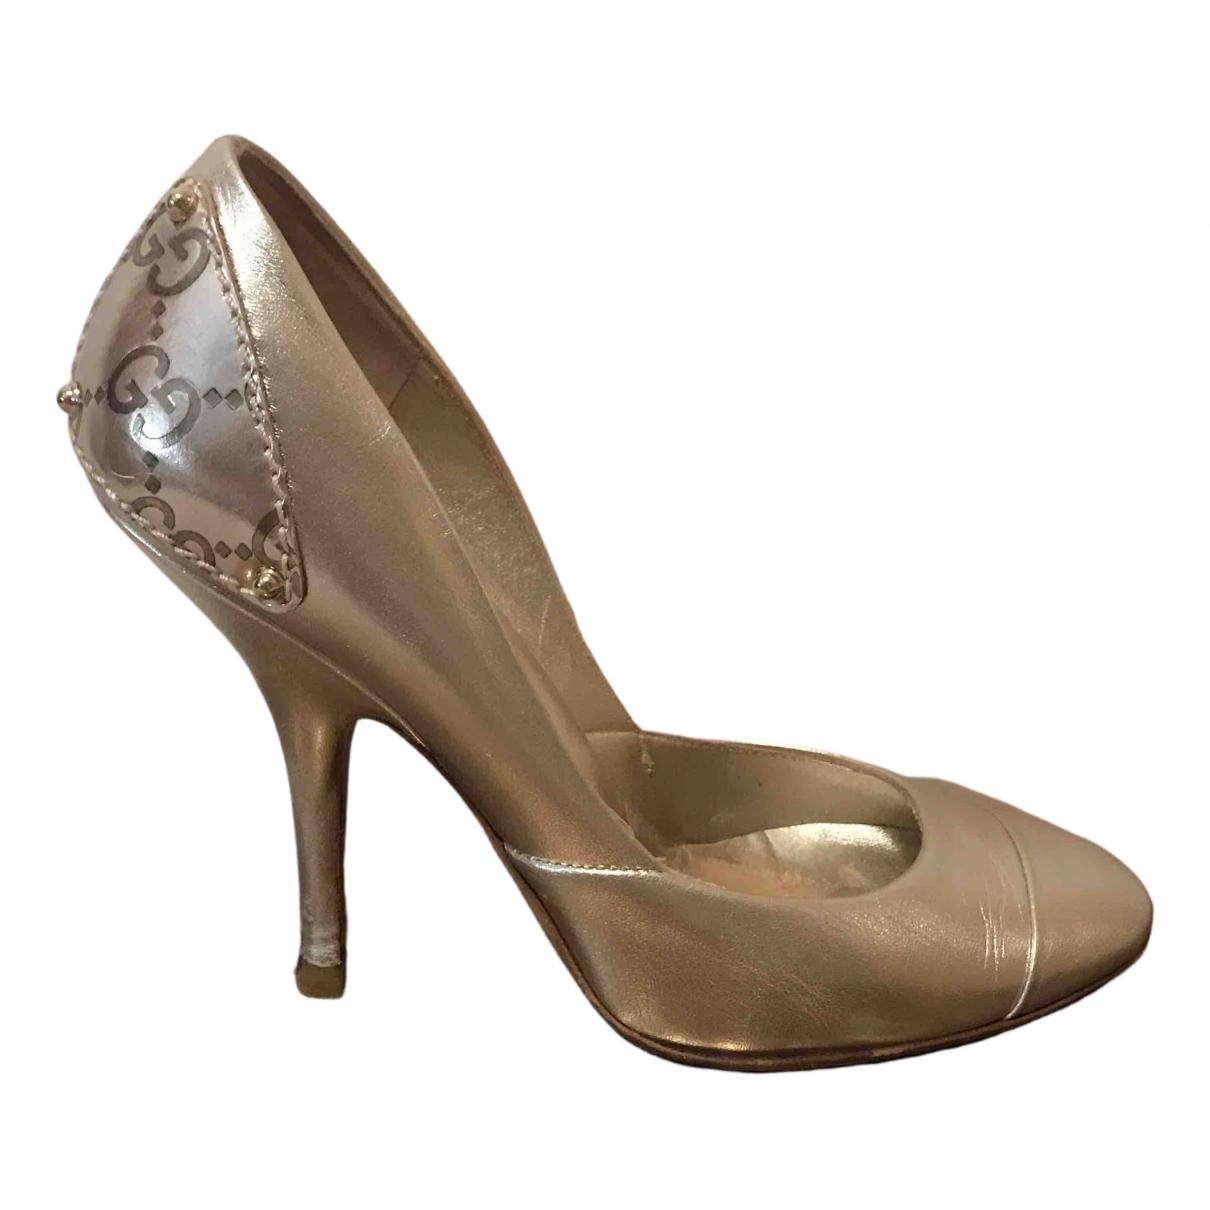 Gucci \N Metallic Leather Heels for Women 34 EU